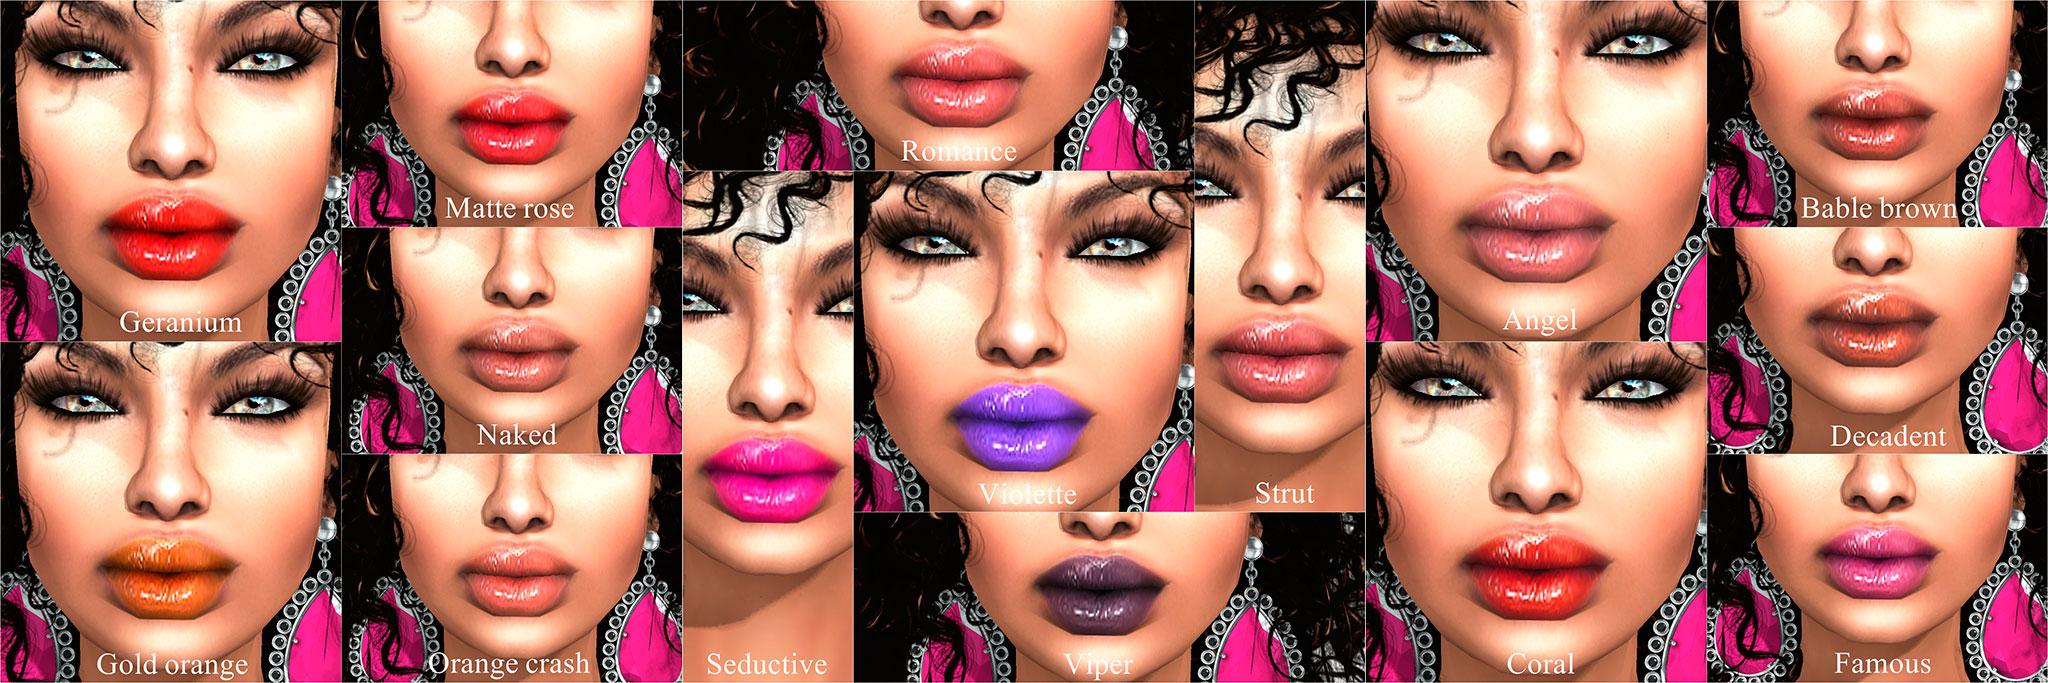 Deesses-Skins-Glamour-lipstick-set